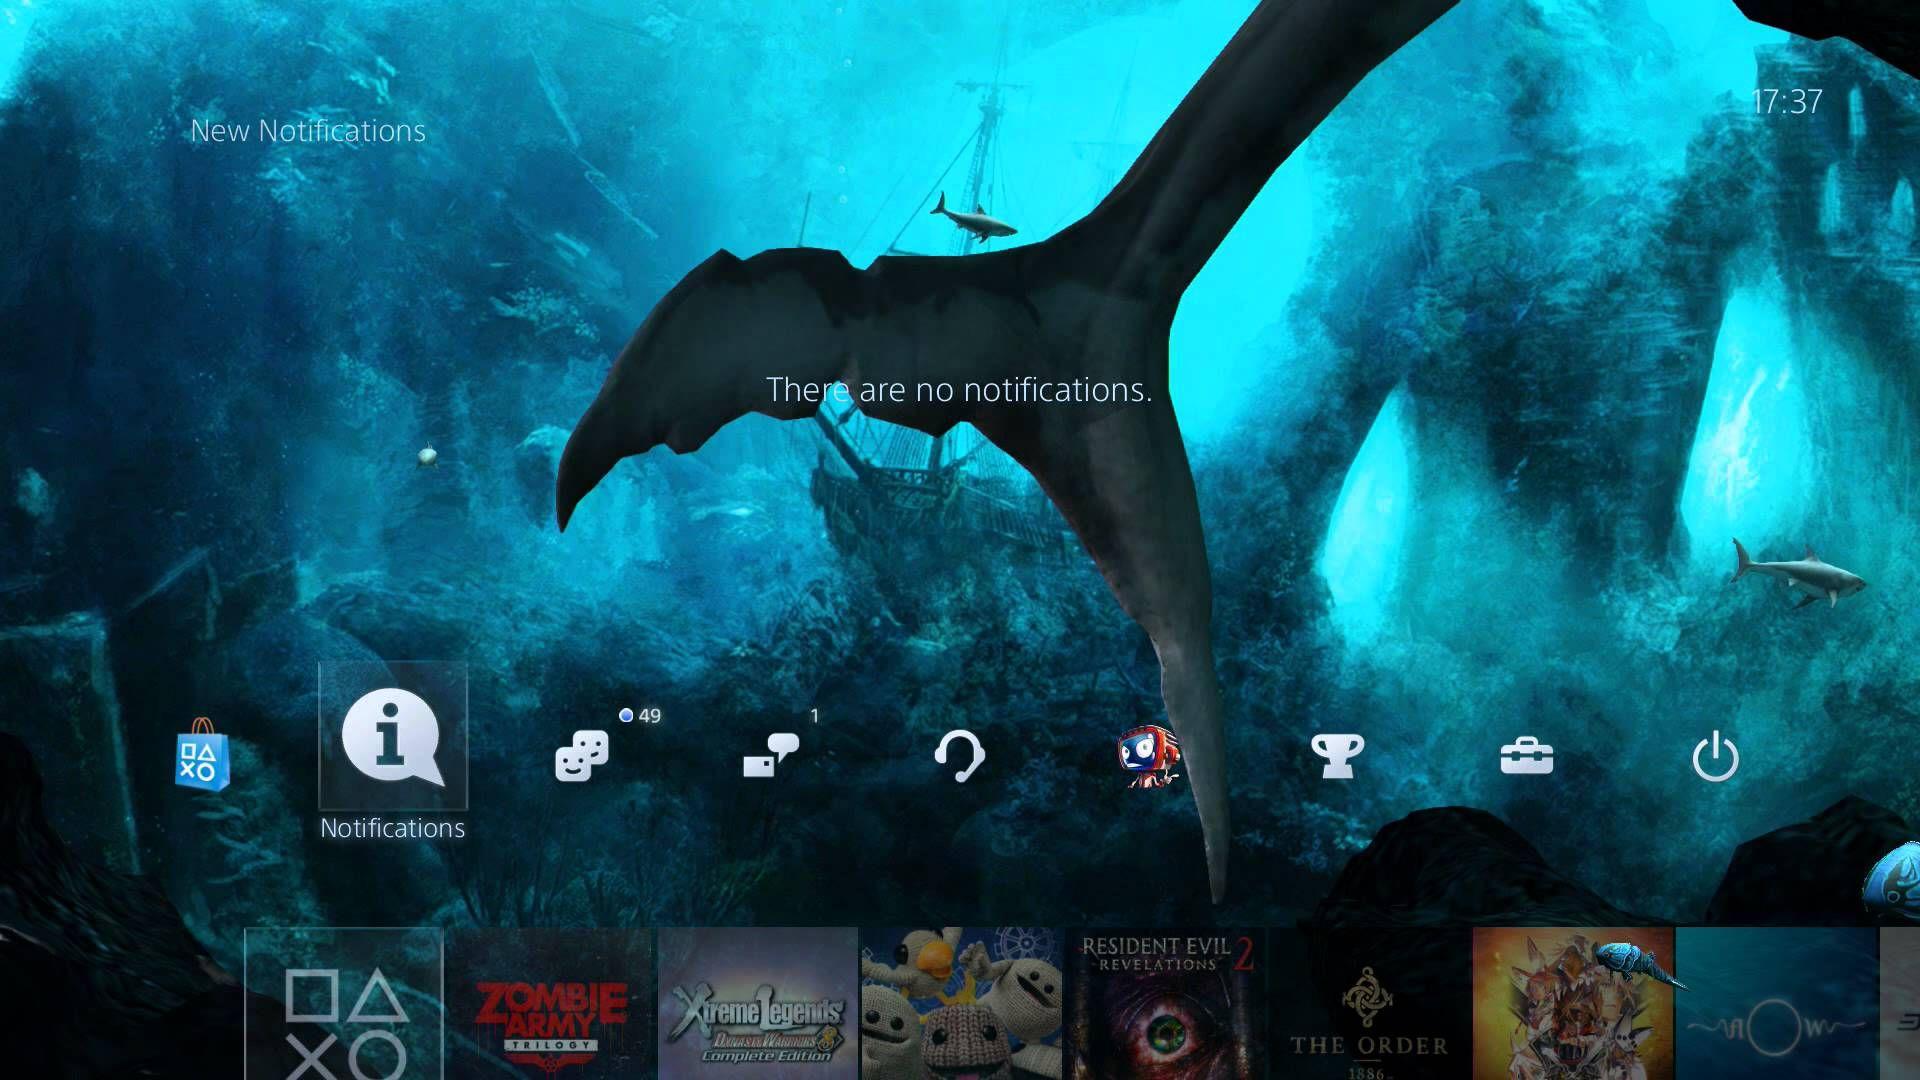 PS4 Dynamic Theme: 3D Poseidon's Aquarium | 创新3D主题